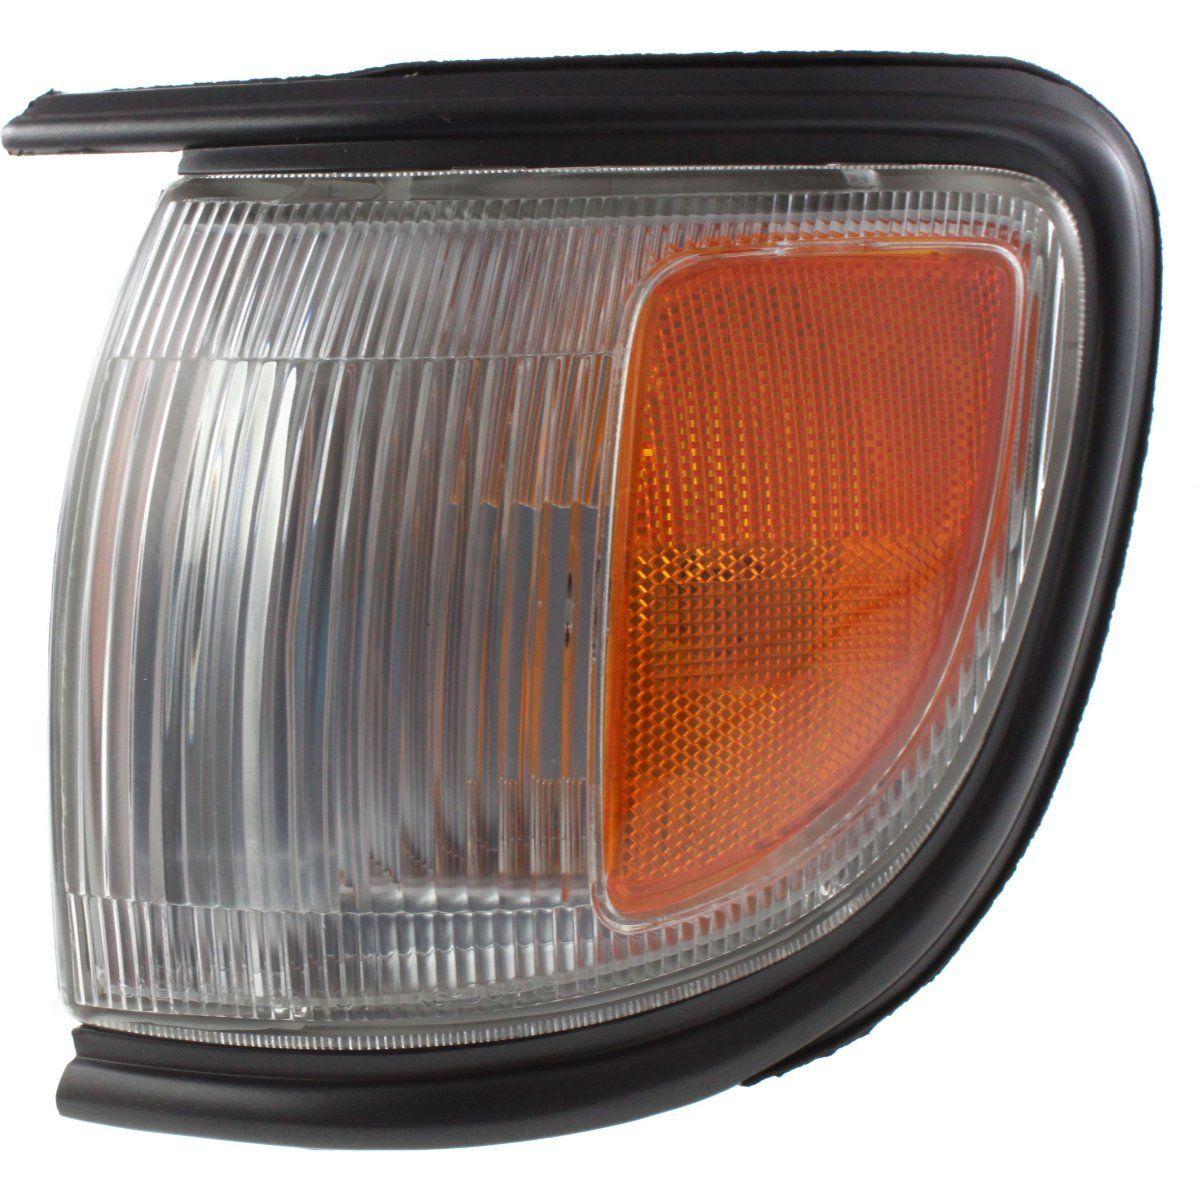 USコーナーライト Corner Light For 96-99 Nissan Pathfinder w/ black trim Left Incandescent w/ Bulb コーナーライトfor 96-99 Nissan Pathfinder w / blackトリム左白熱電球付き